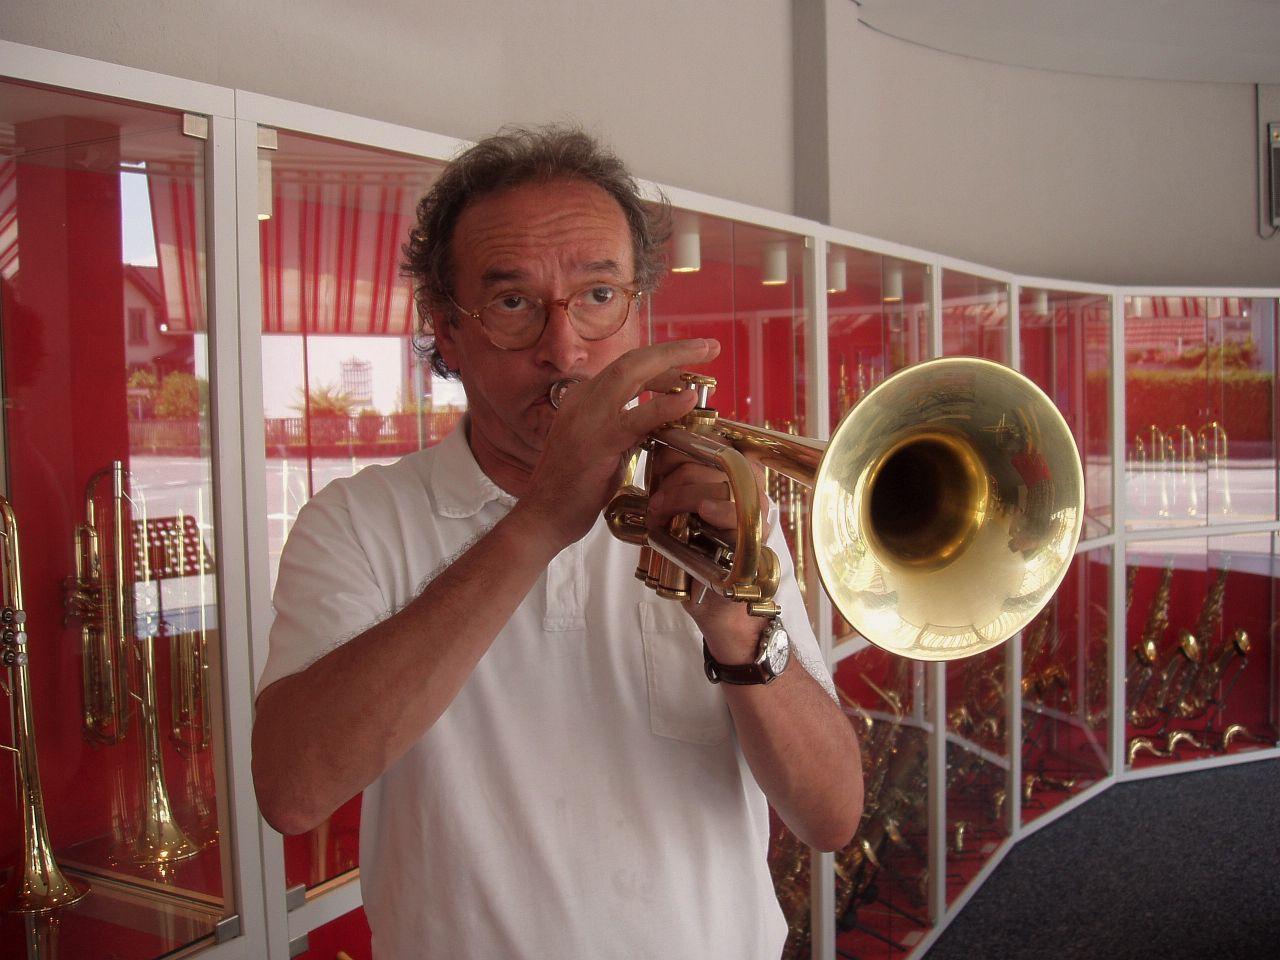 Musiker 253